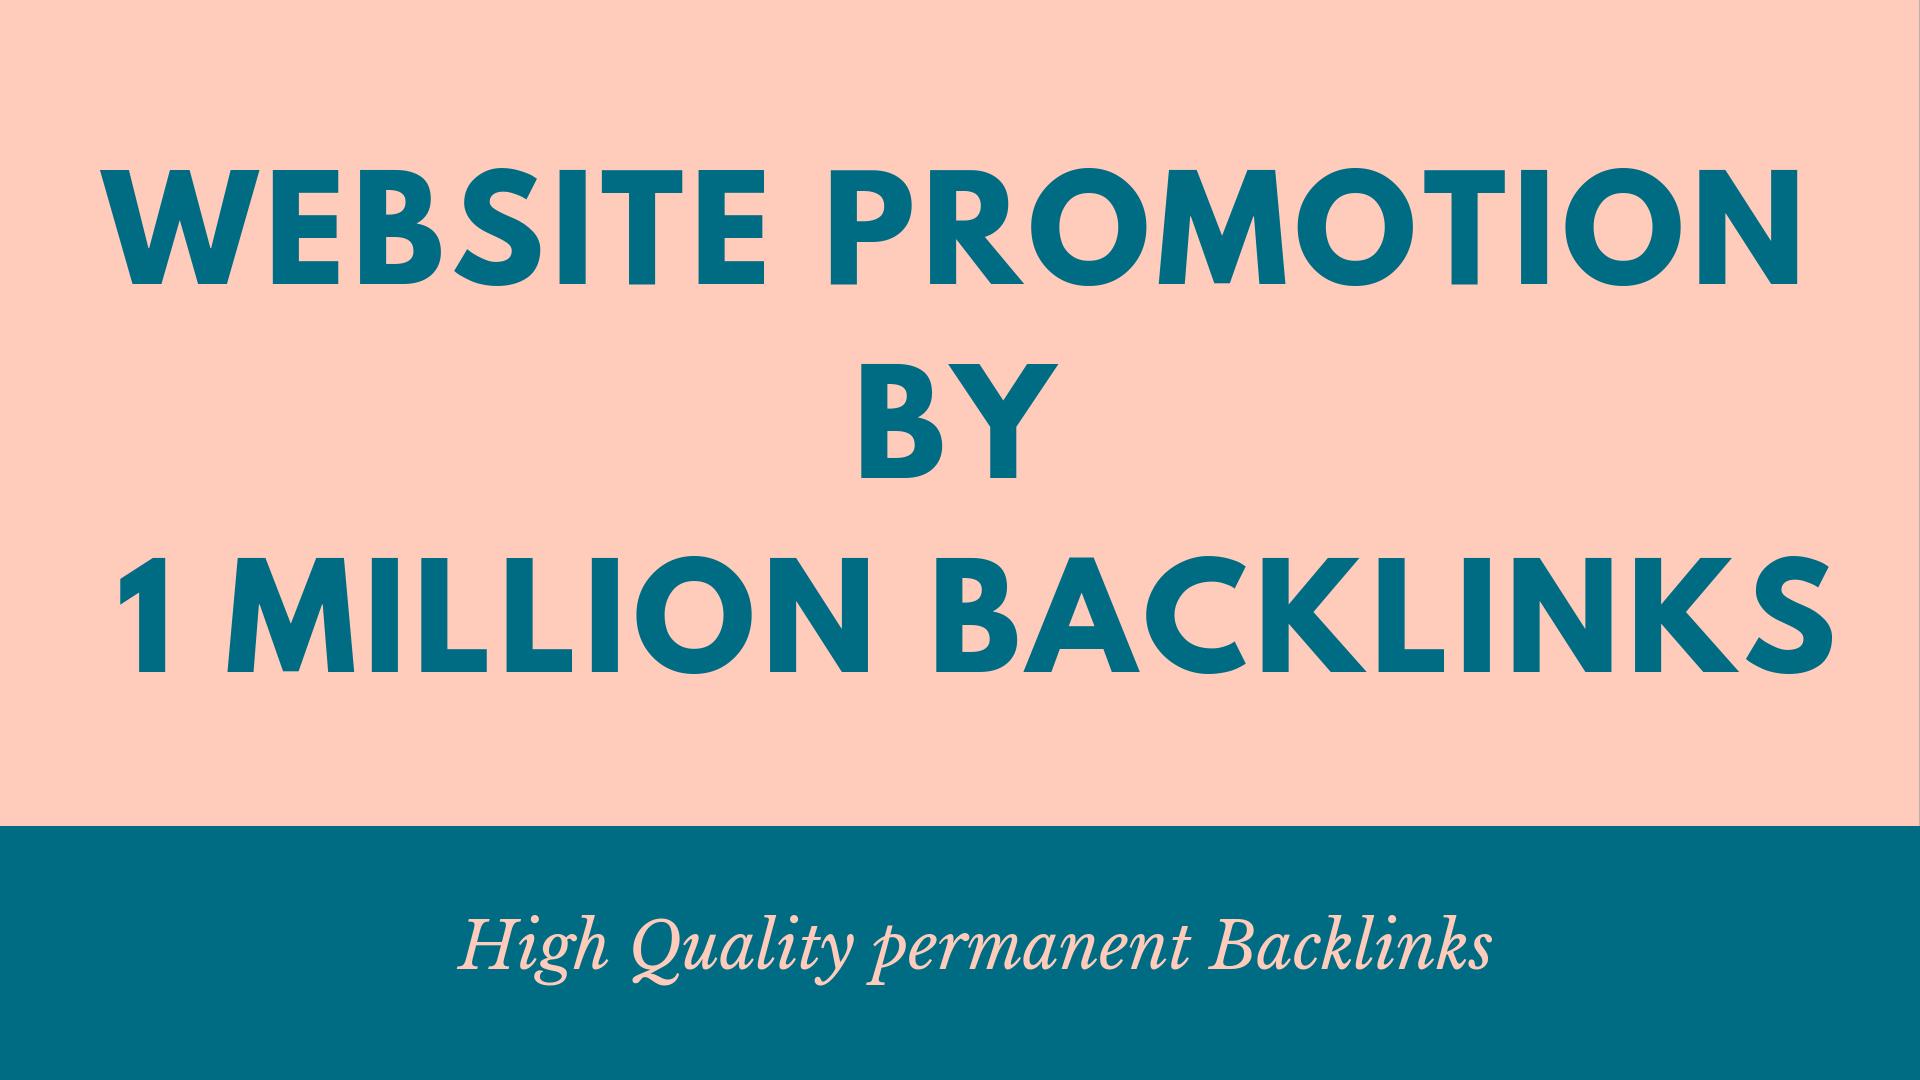 Provide website promotion by 1 million backlinks